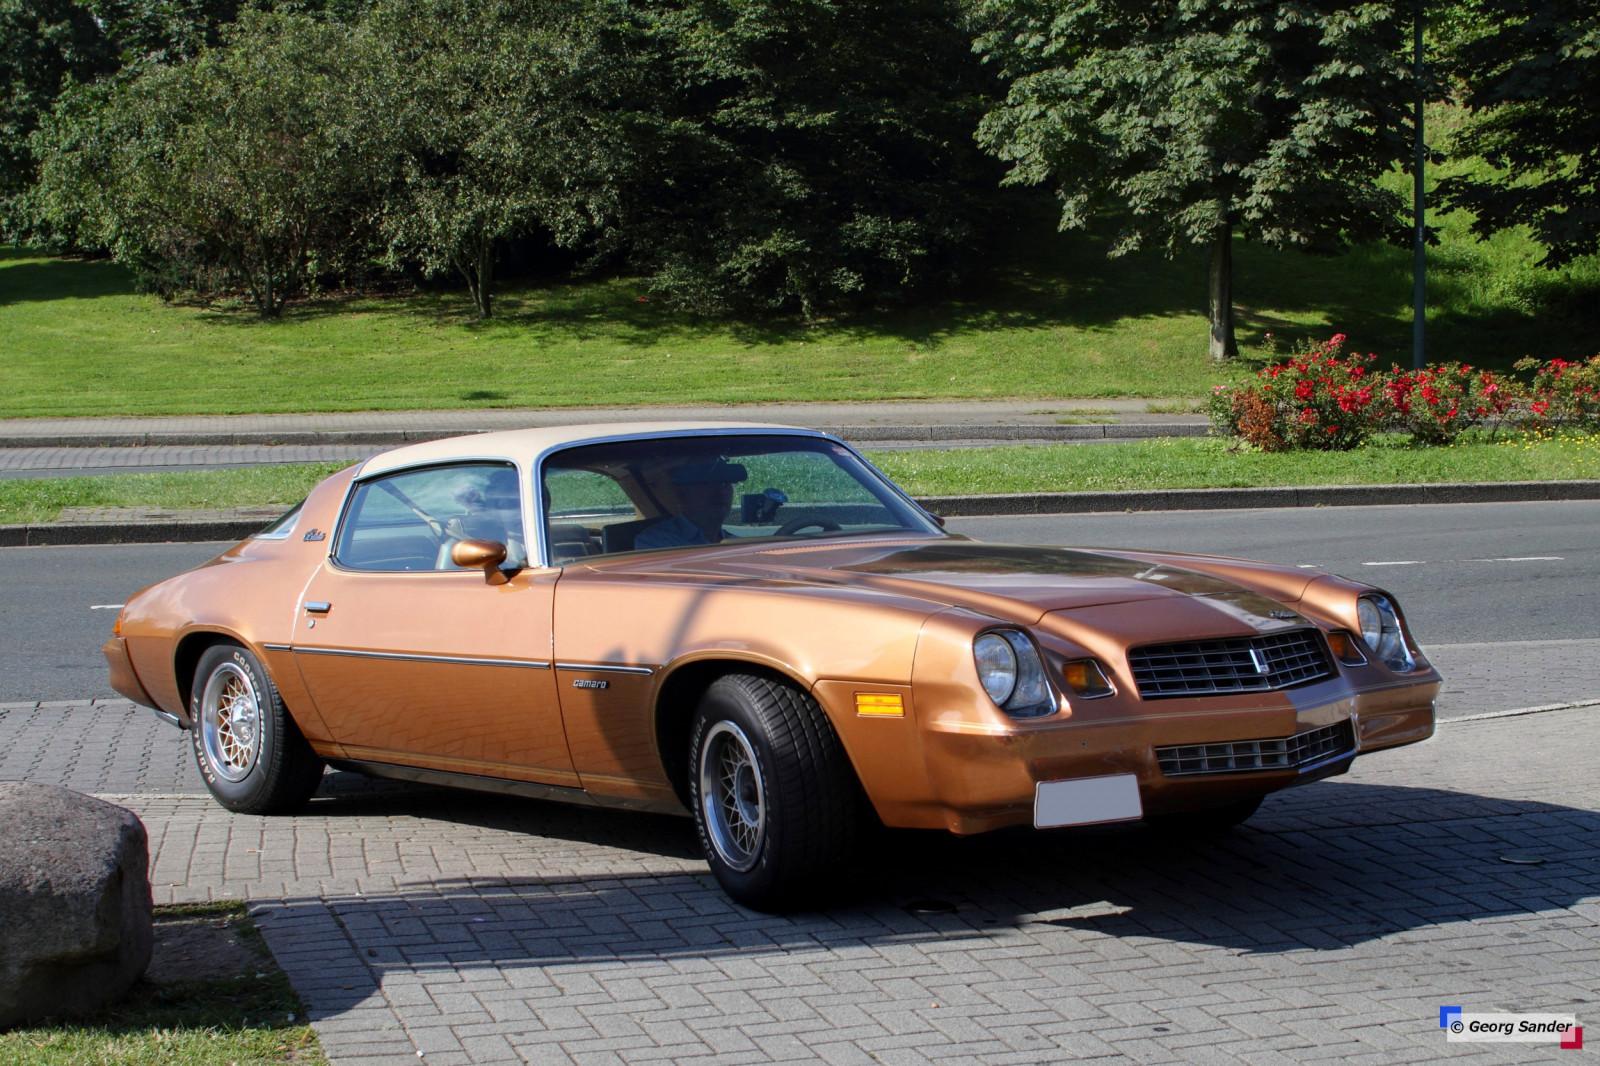 Wallpaper : old, Camaro, sports car, coupe, Chevrolet, Convertible ...